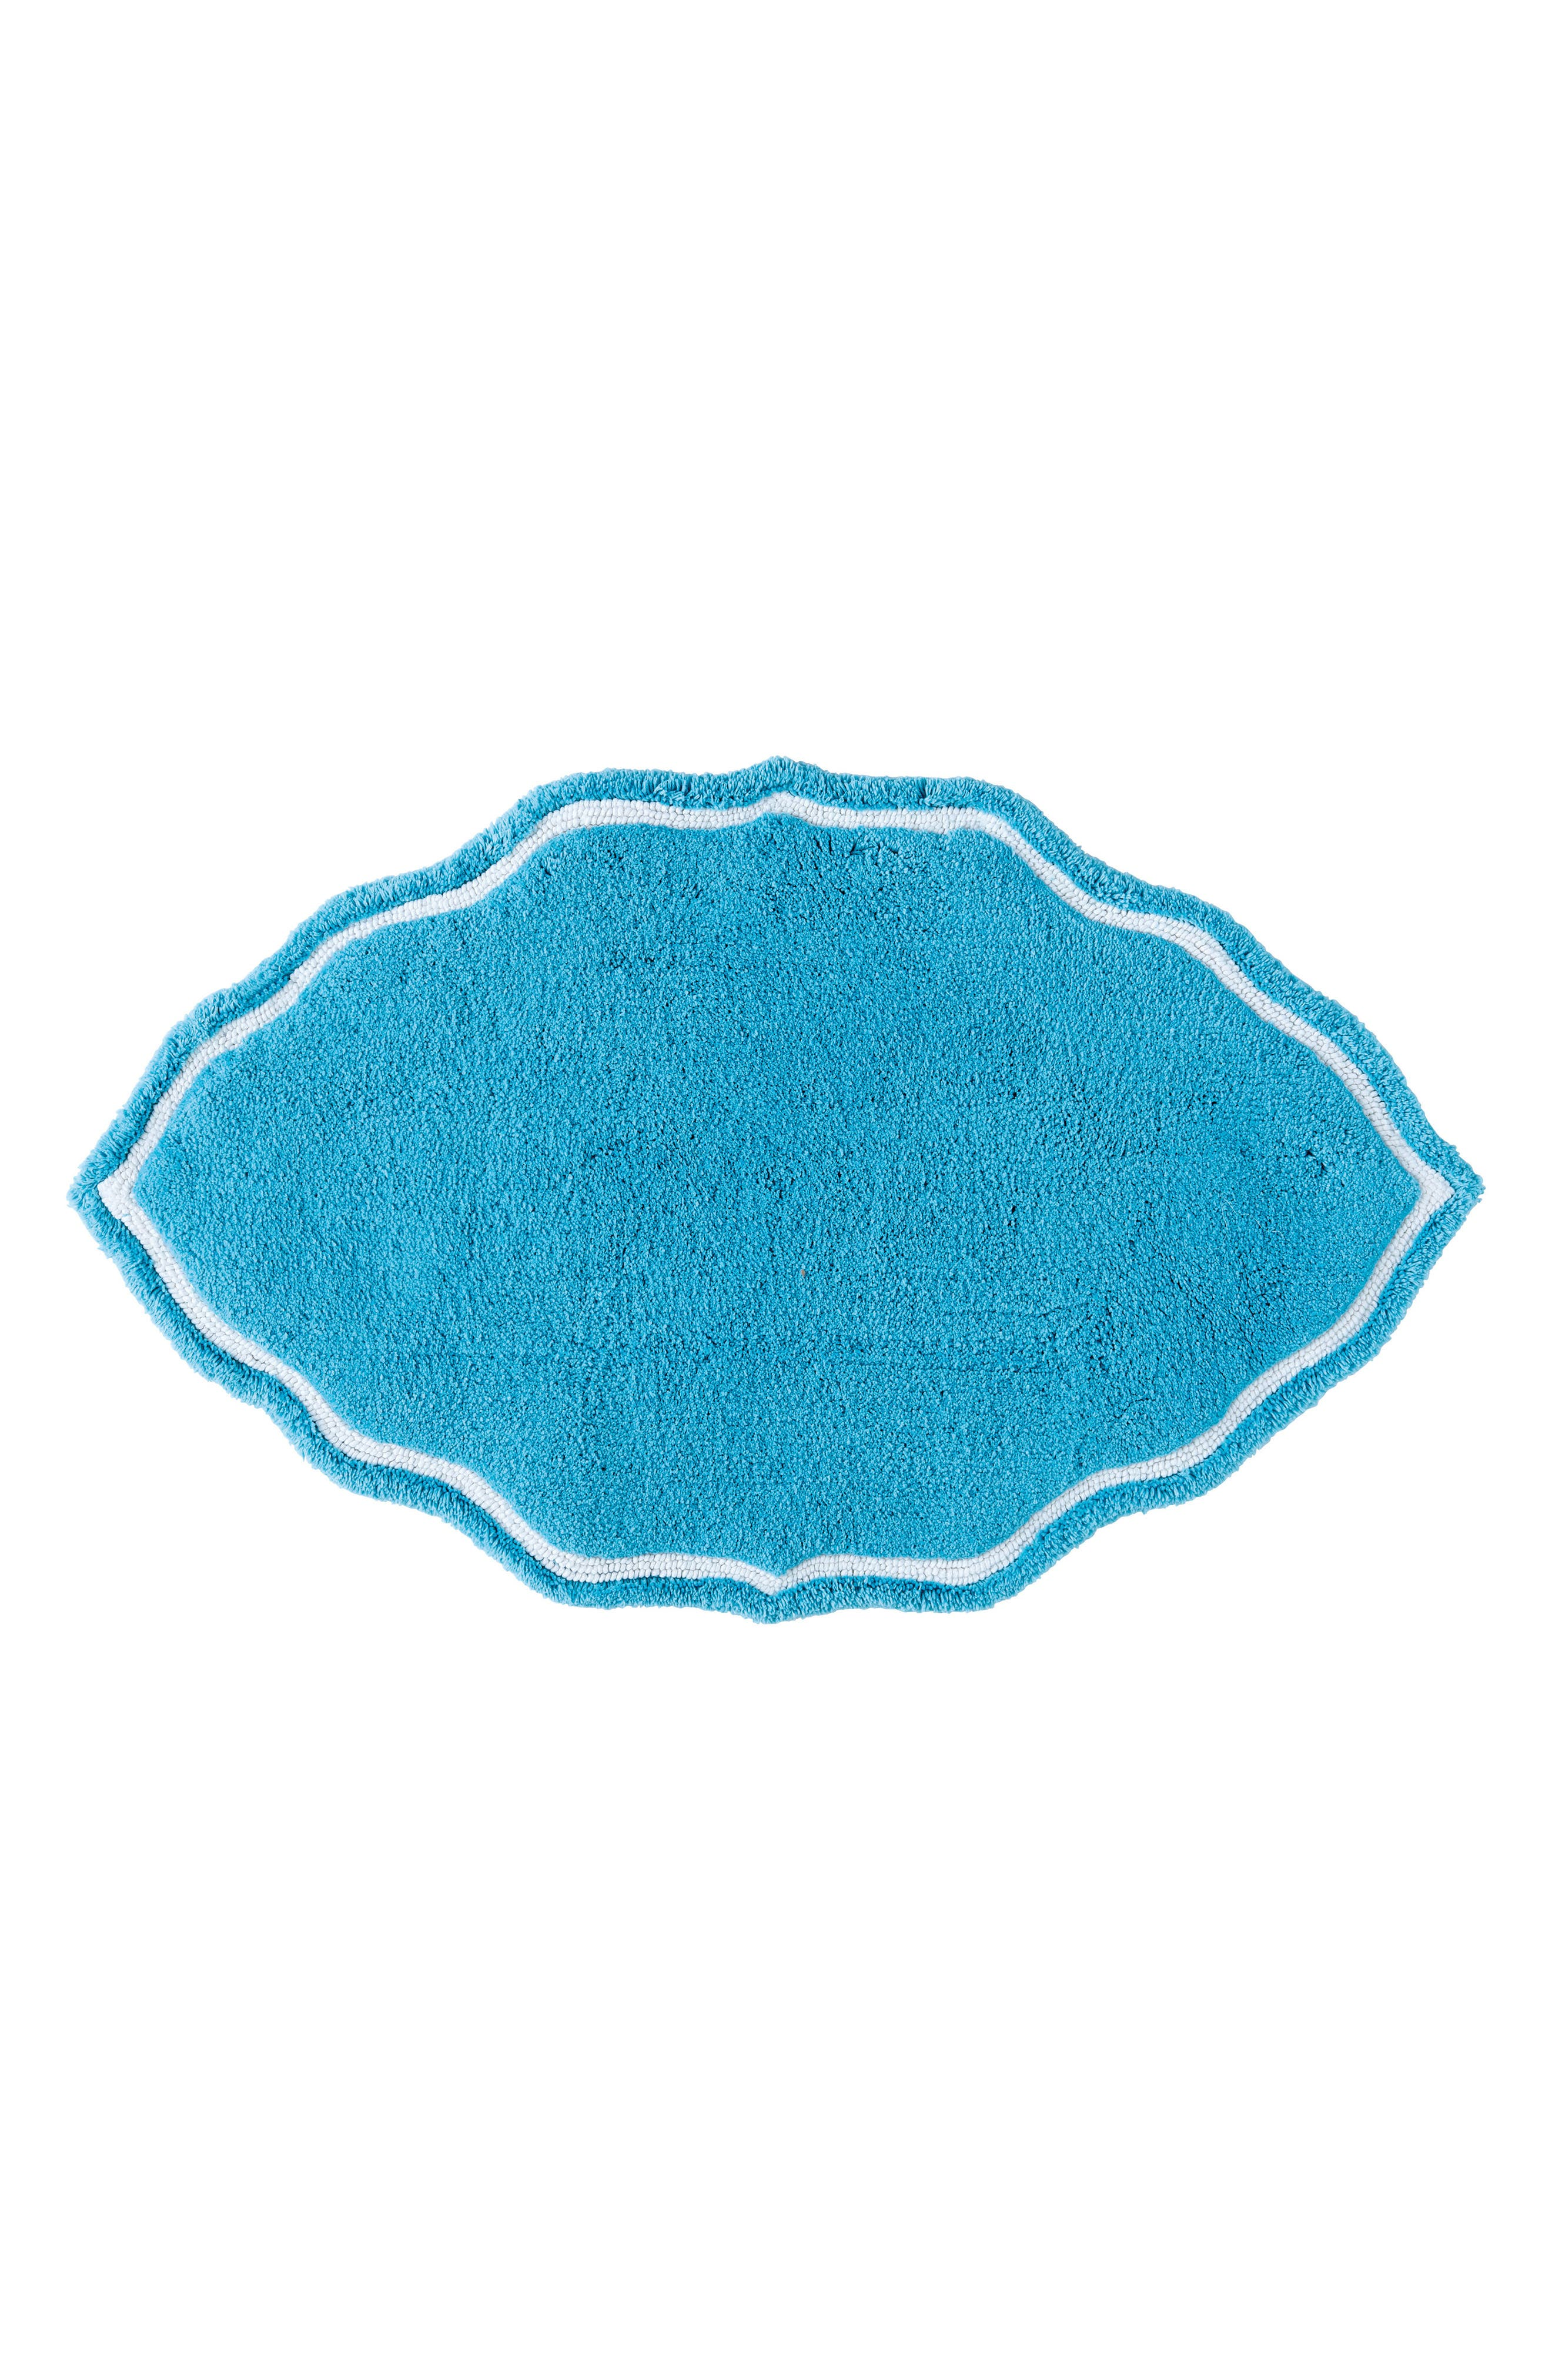 Signature Hand Tufted Bath Rug,                         Main,                         color, Peacock Blue